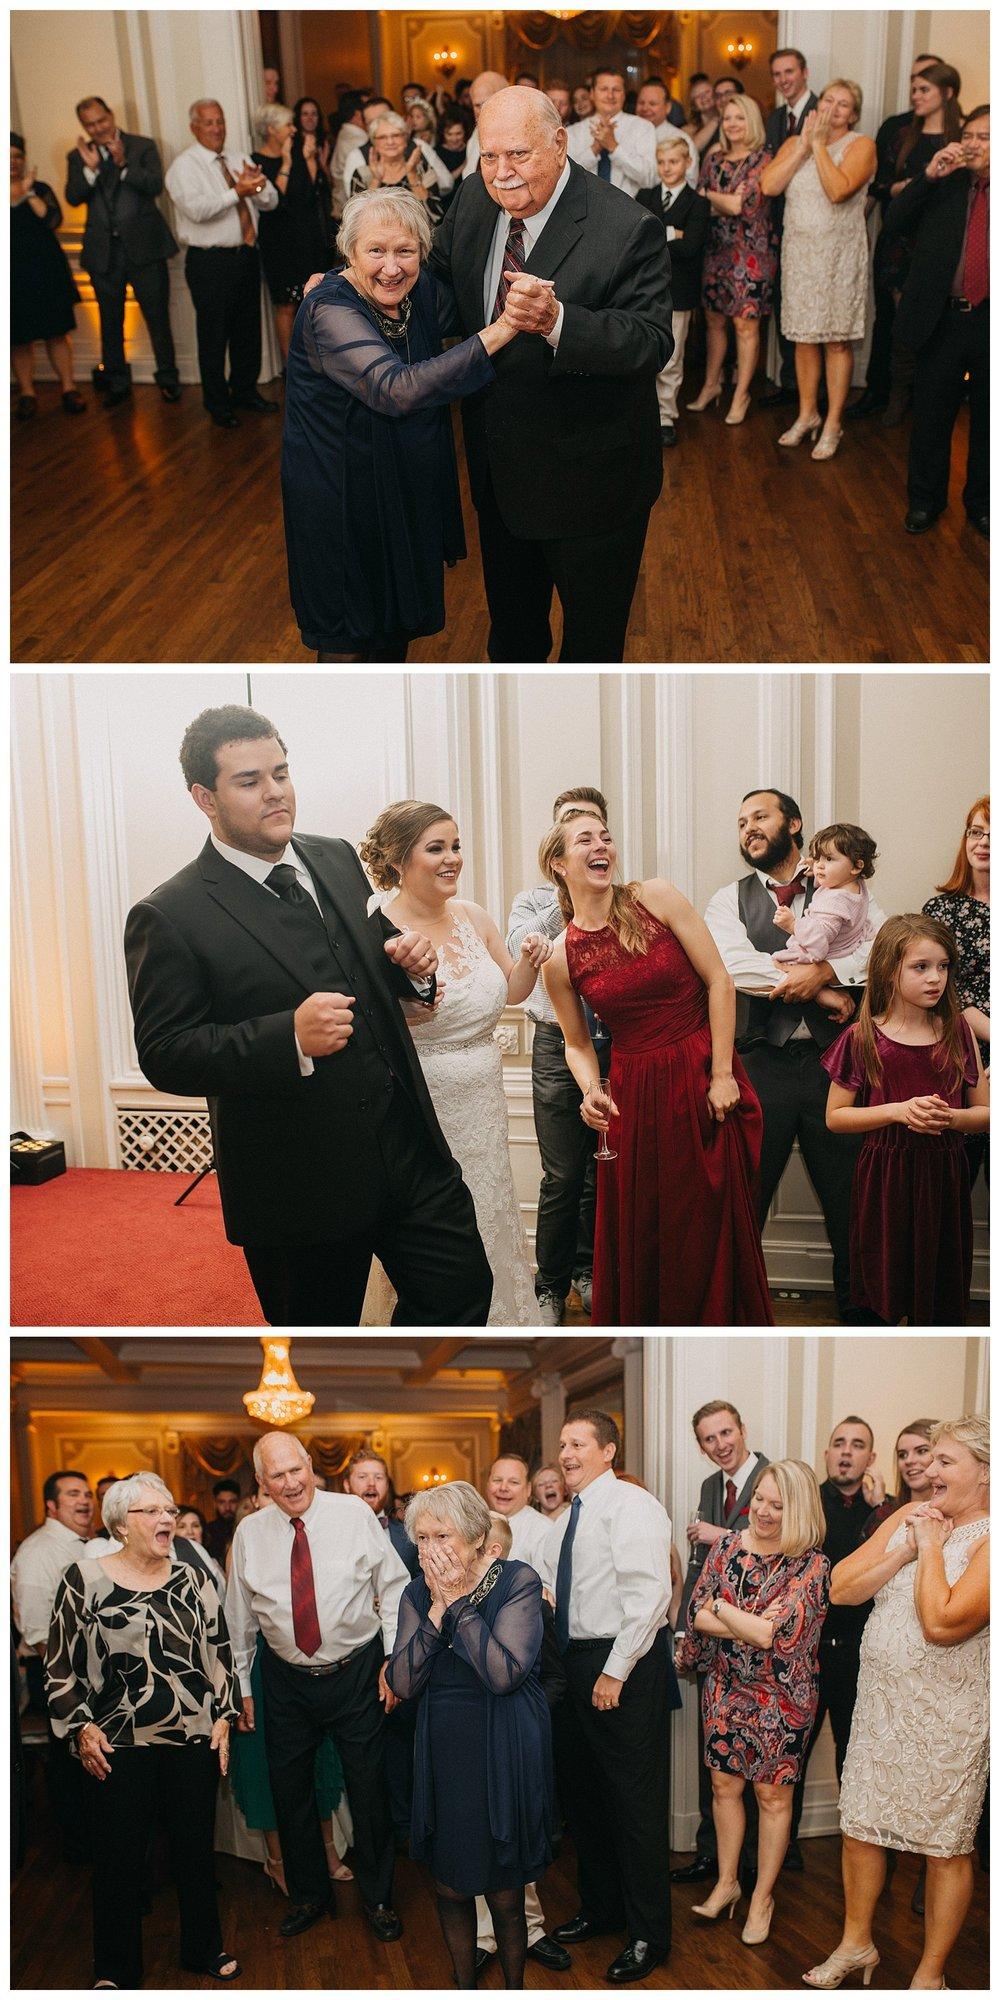 Kelsey_Diane_Photography_Loose_Mansion_Wedding_Photography_Kansas_City_Victor_Lyndsay_0172.jpg